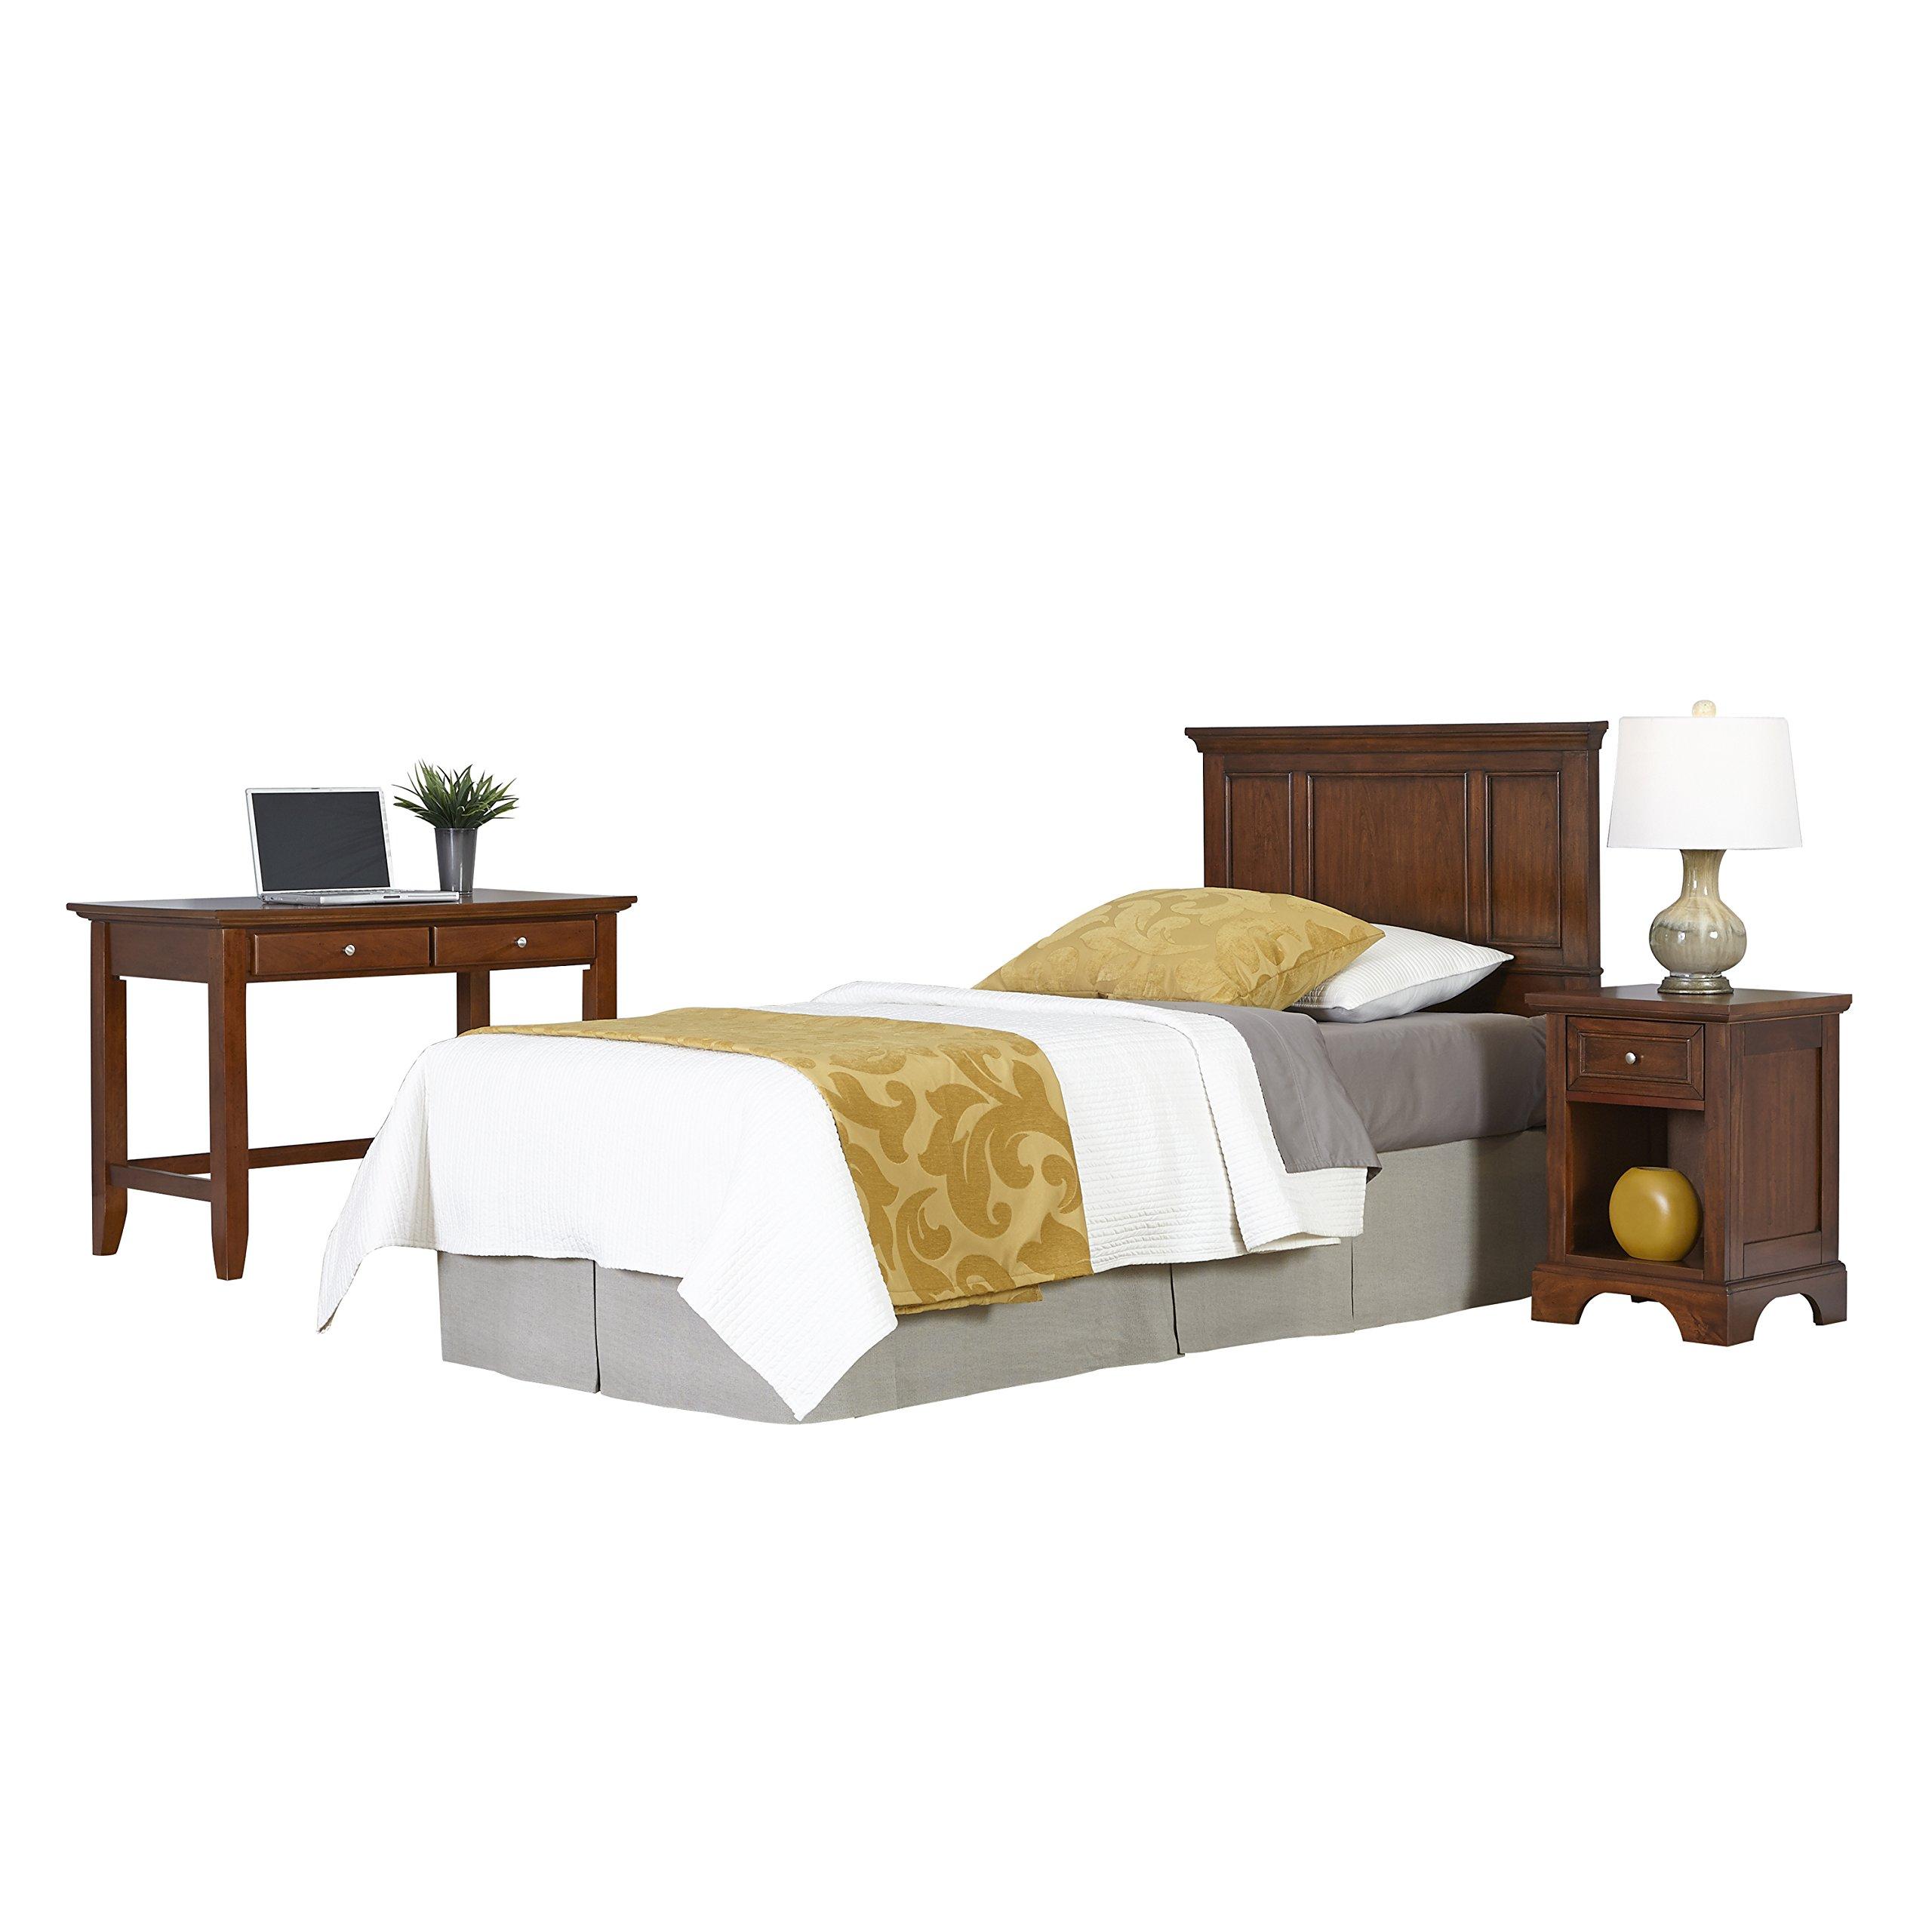 Home Styles 5529-4025 Chesapeake Twin Headboard, Night Stand and Student Desk, Cherry